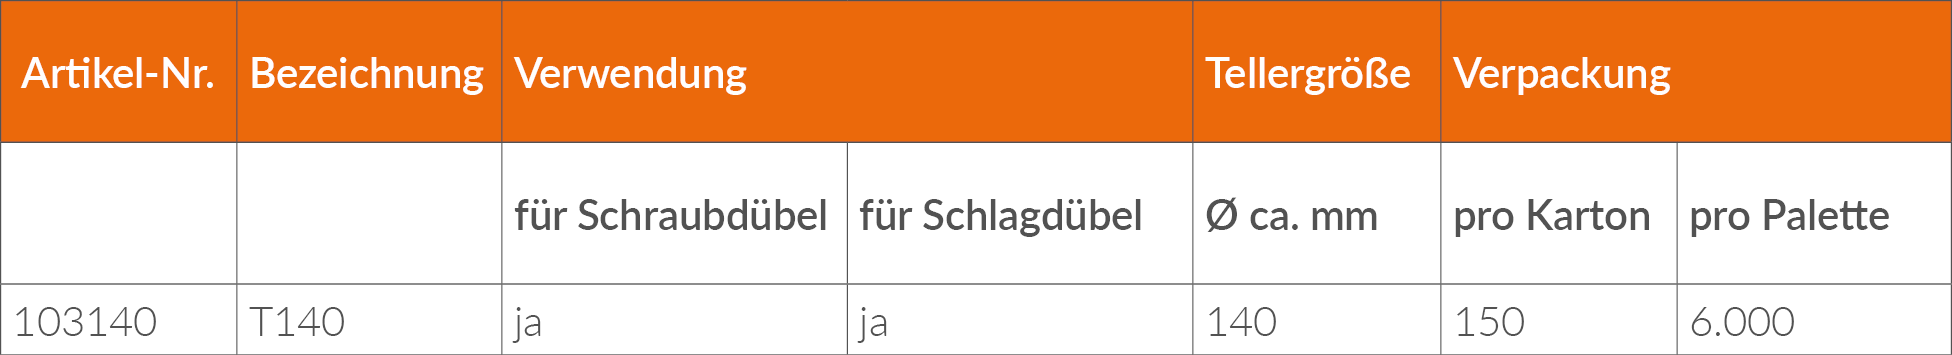 T140_Lieferprogramm